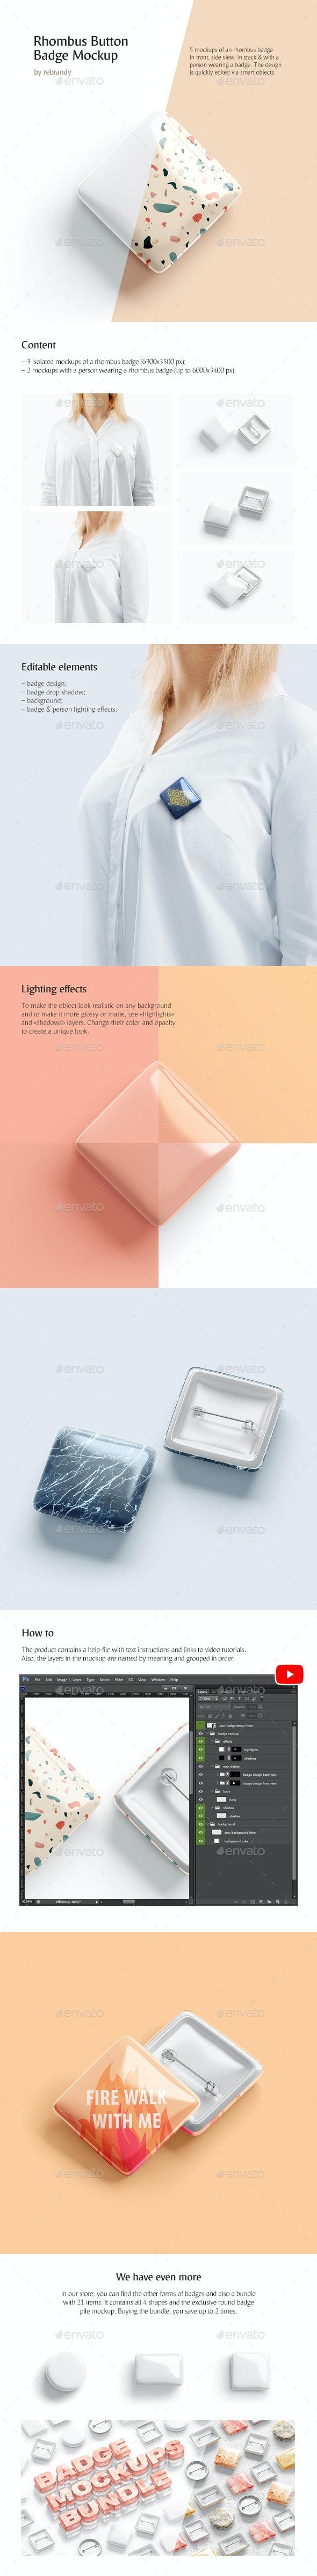 Rhombus Button Badge Mockup - Product Mock-Ups Graphics